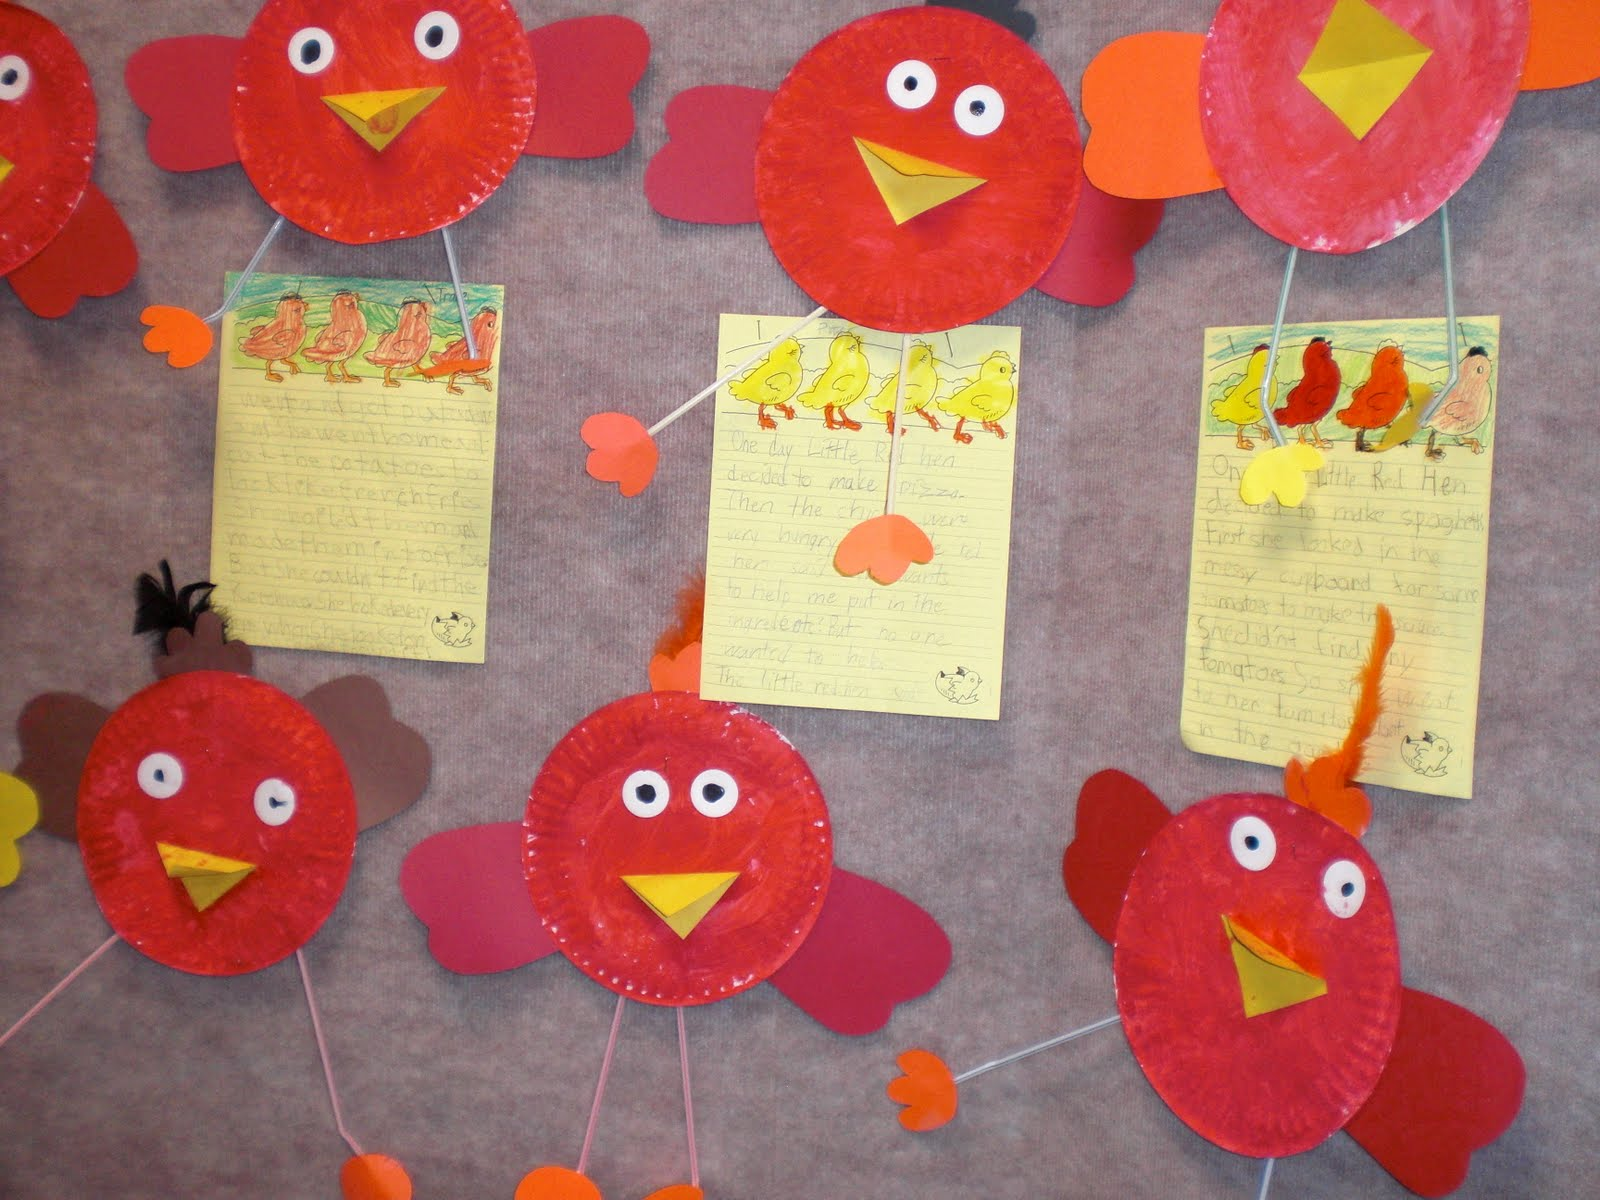 PATTIES CLASSROOM: The Little Red Hen